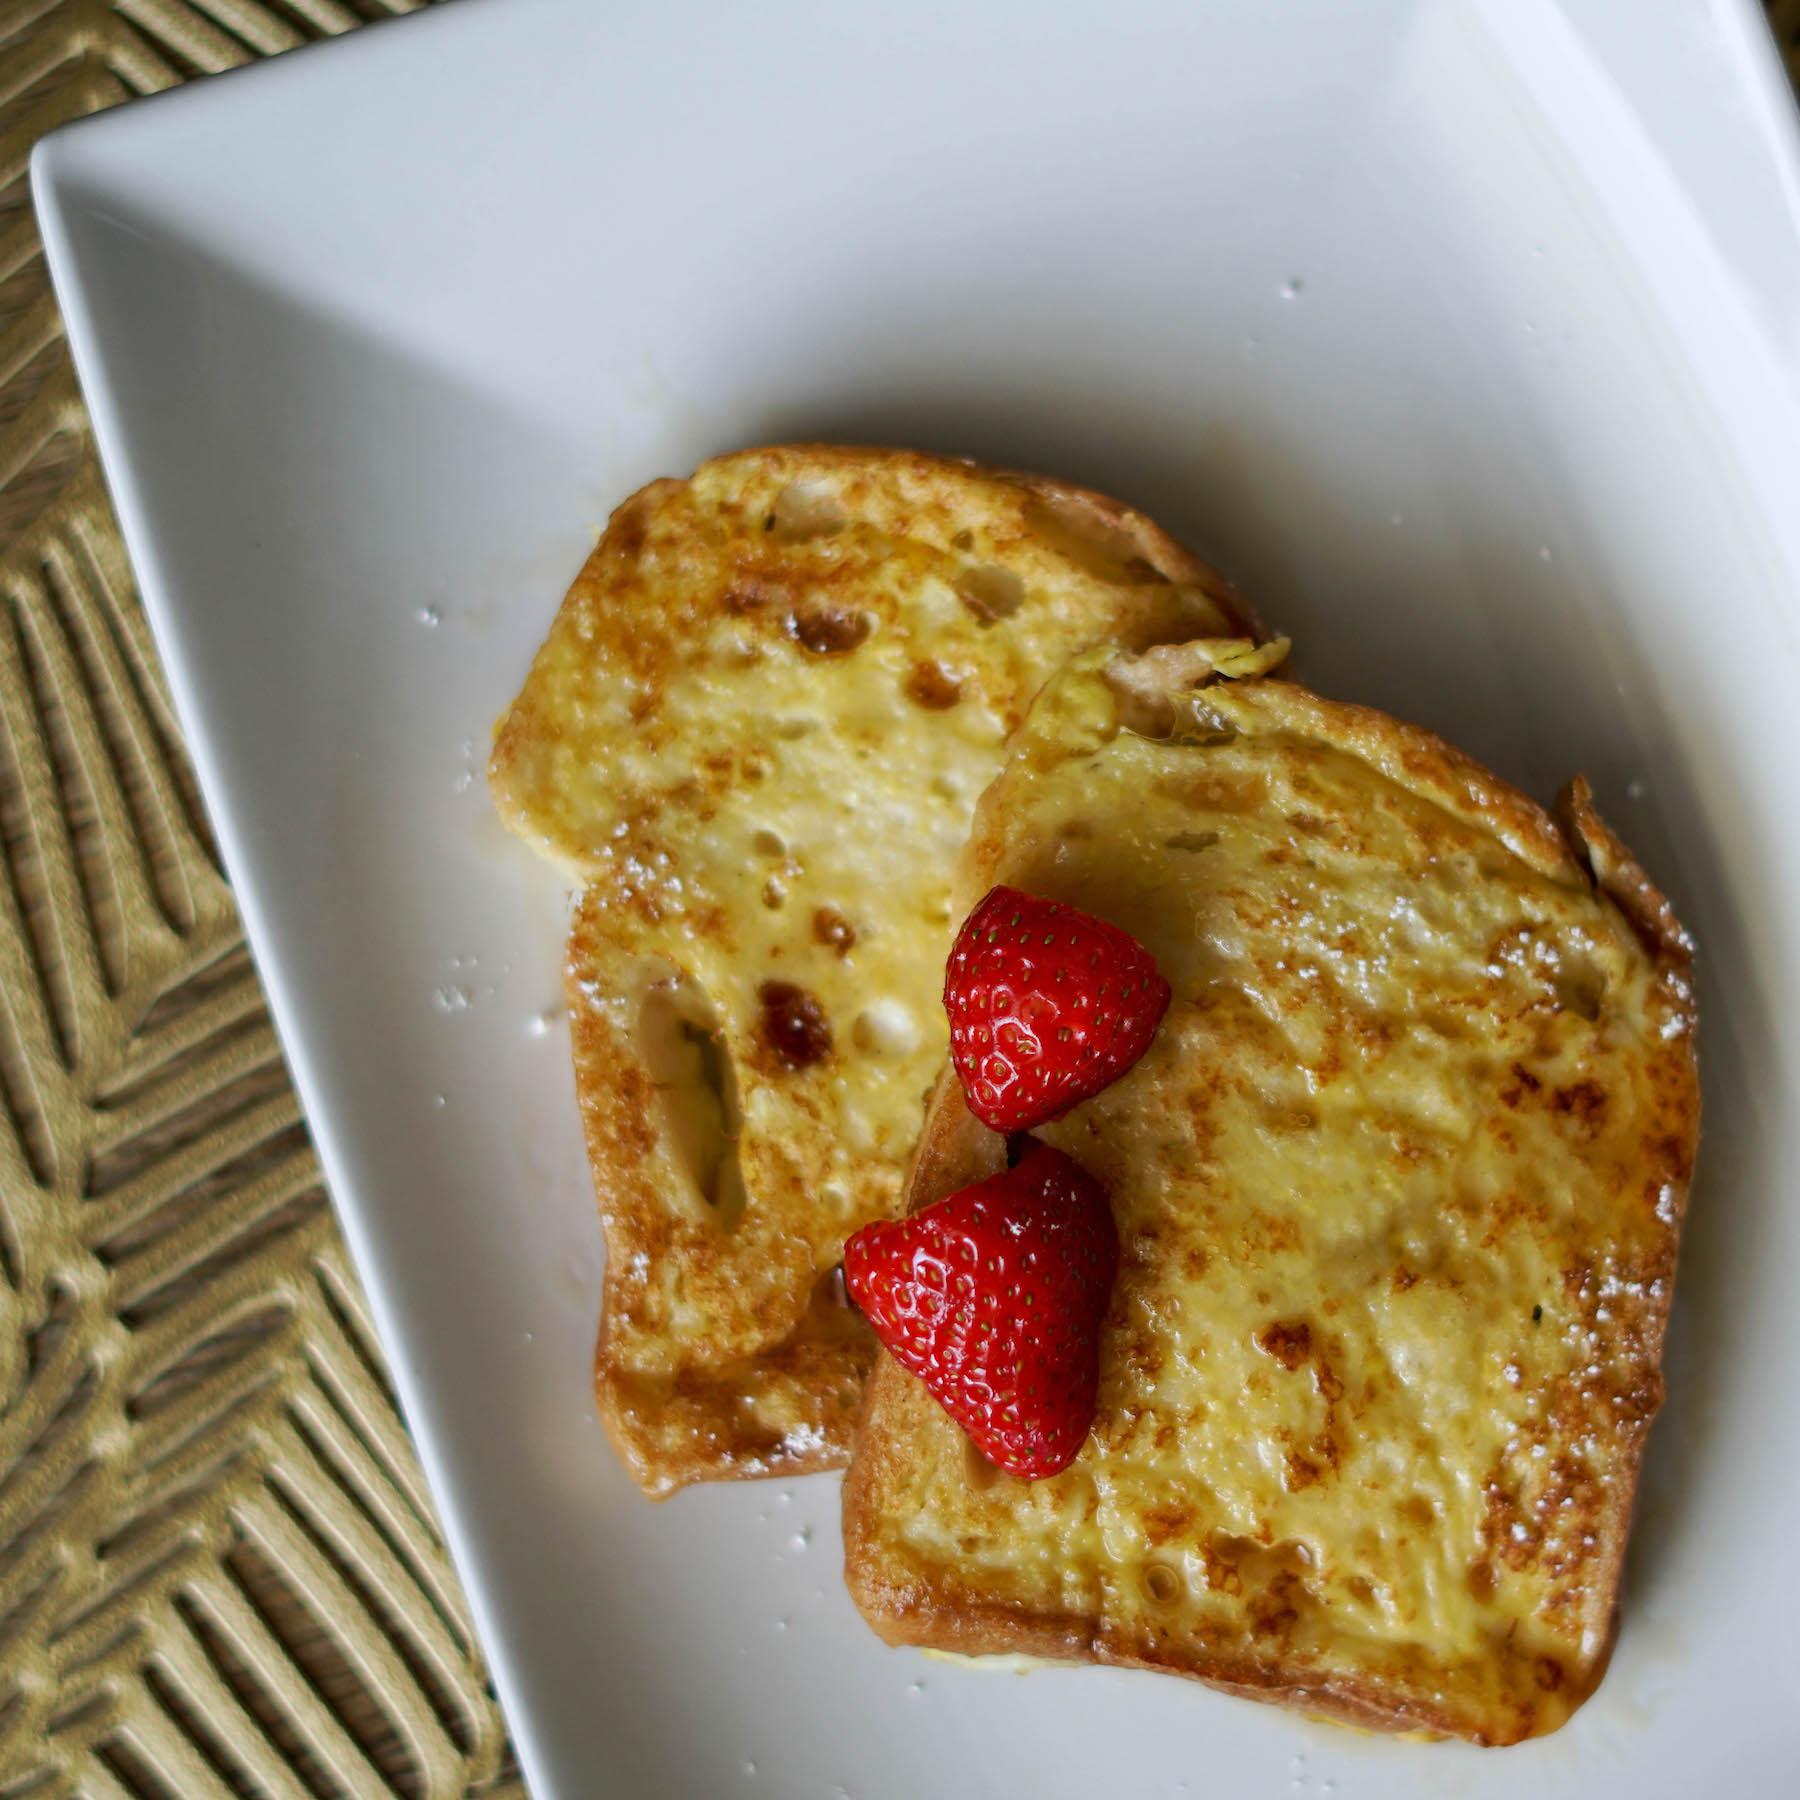 French toast rezept Glutenfrei suelovesnyc_susan_fengler_french_toast_rezept_glutenfrei